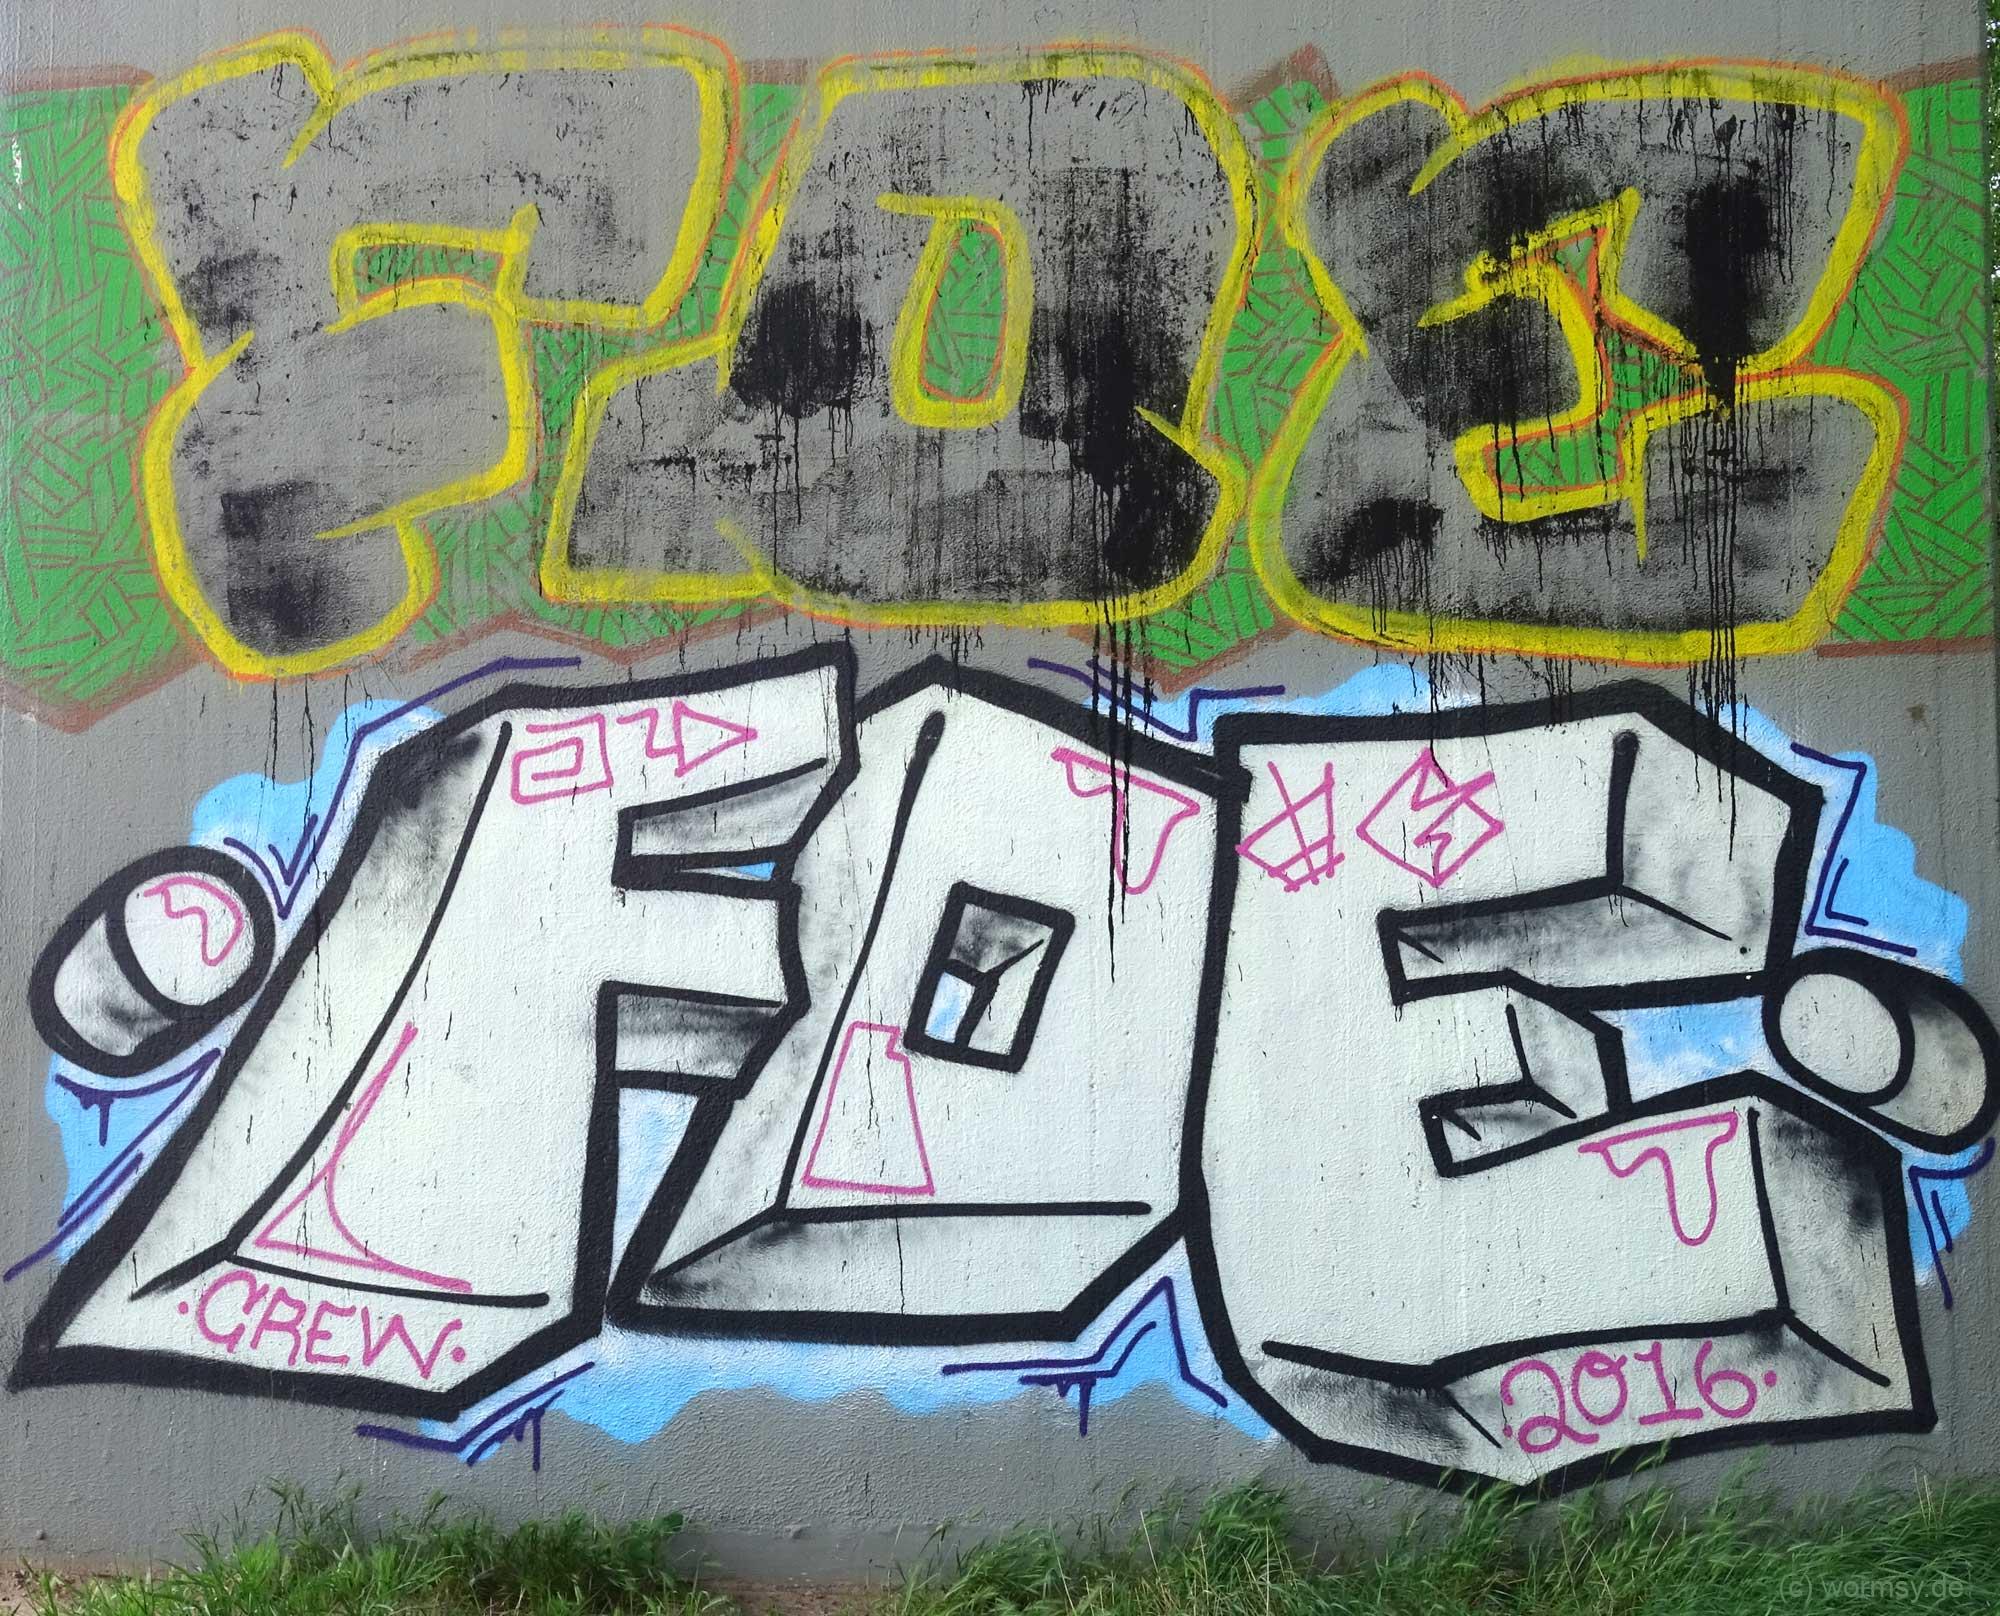 Graffiti unter der Talbrücke Worms-Pfeddersheim - FOE